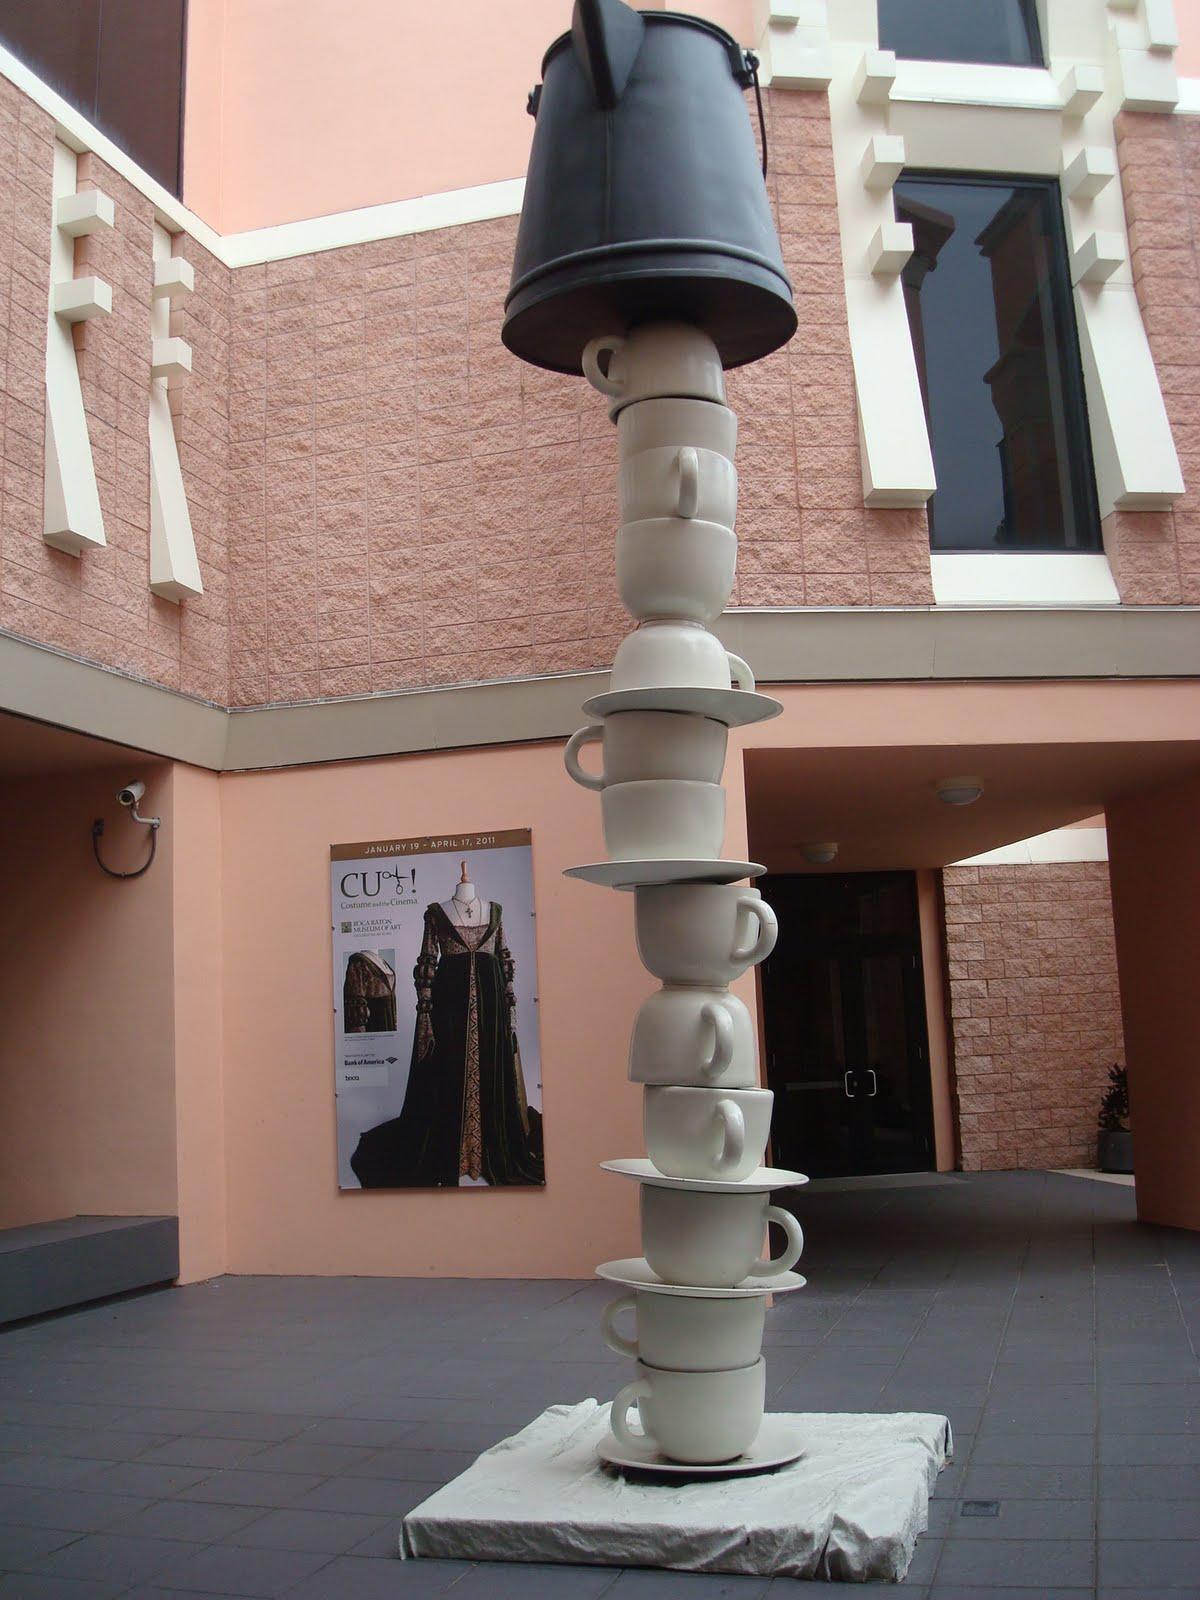 http://3.bp.blogspot.com/_0Y2QvHKyois/TT9NkDupVaI/AAAAAAAAU5M/rLOQn259SMM/s1600/braton-museu-arte-julio-larraz.JPG